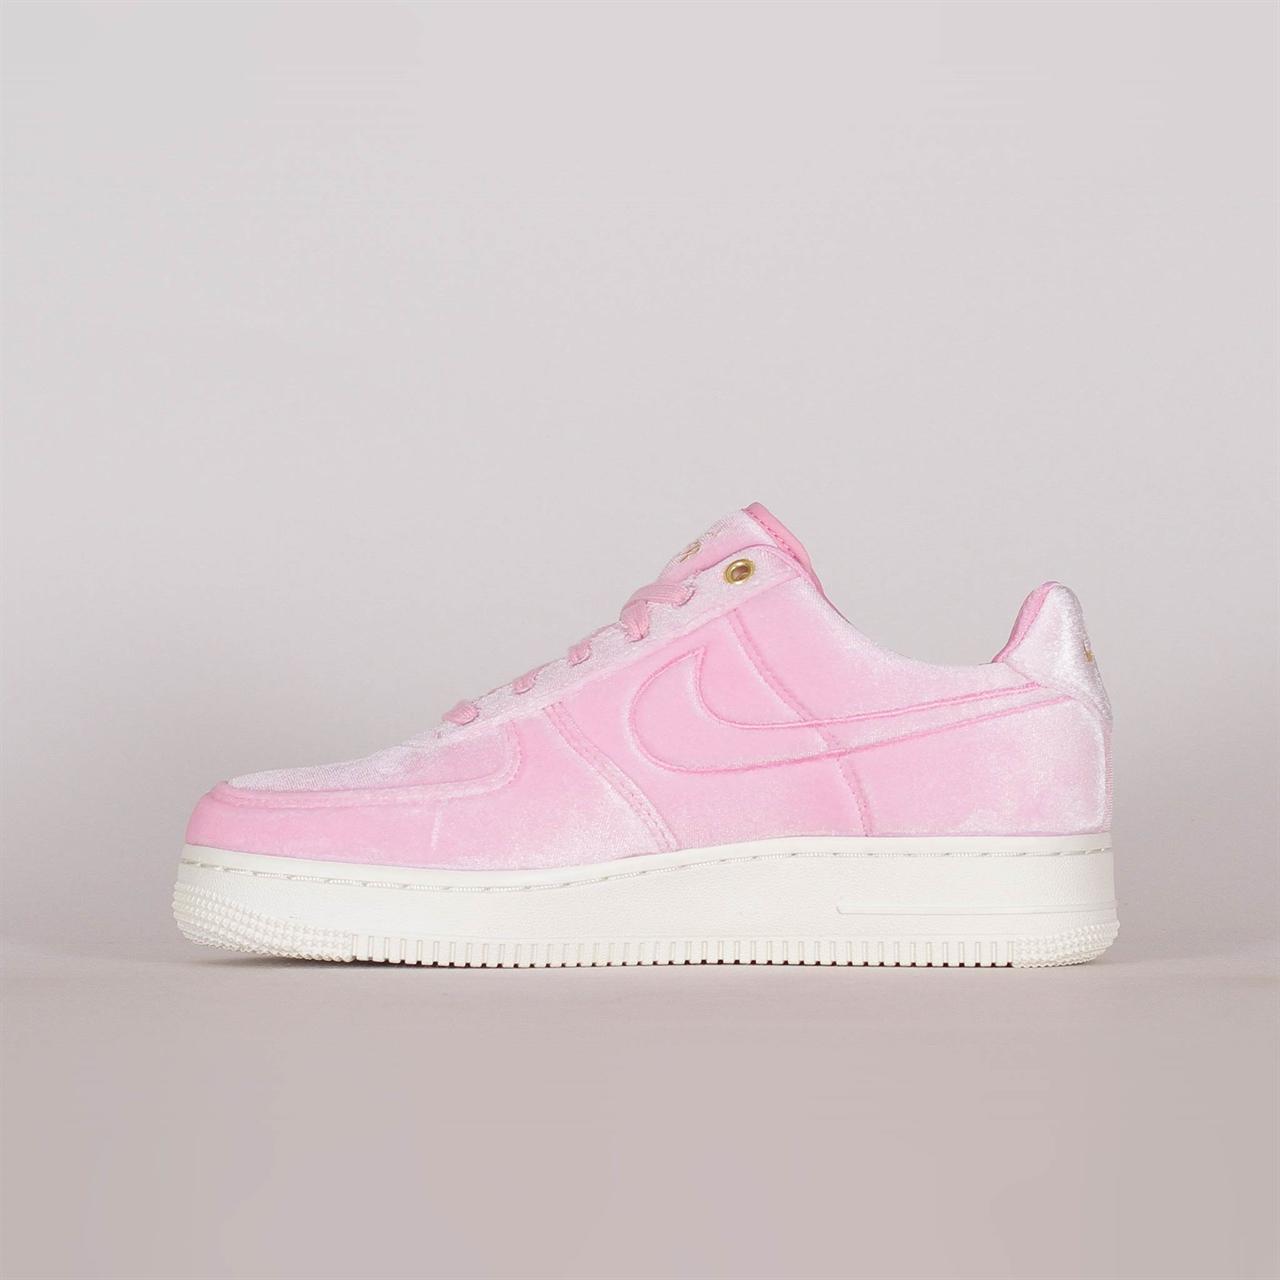 sports shoes 579eb 5f850 NikeNike Air Force 1 07 Premium 3 (AT4144-600). 1